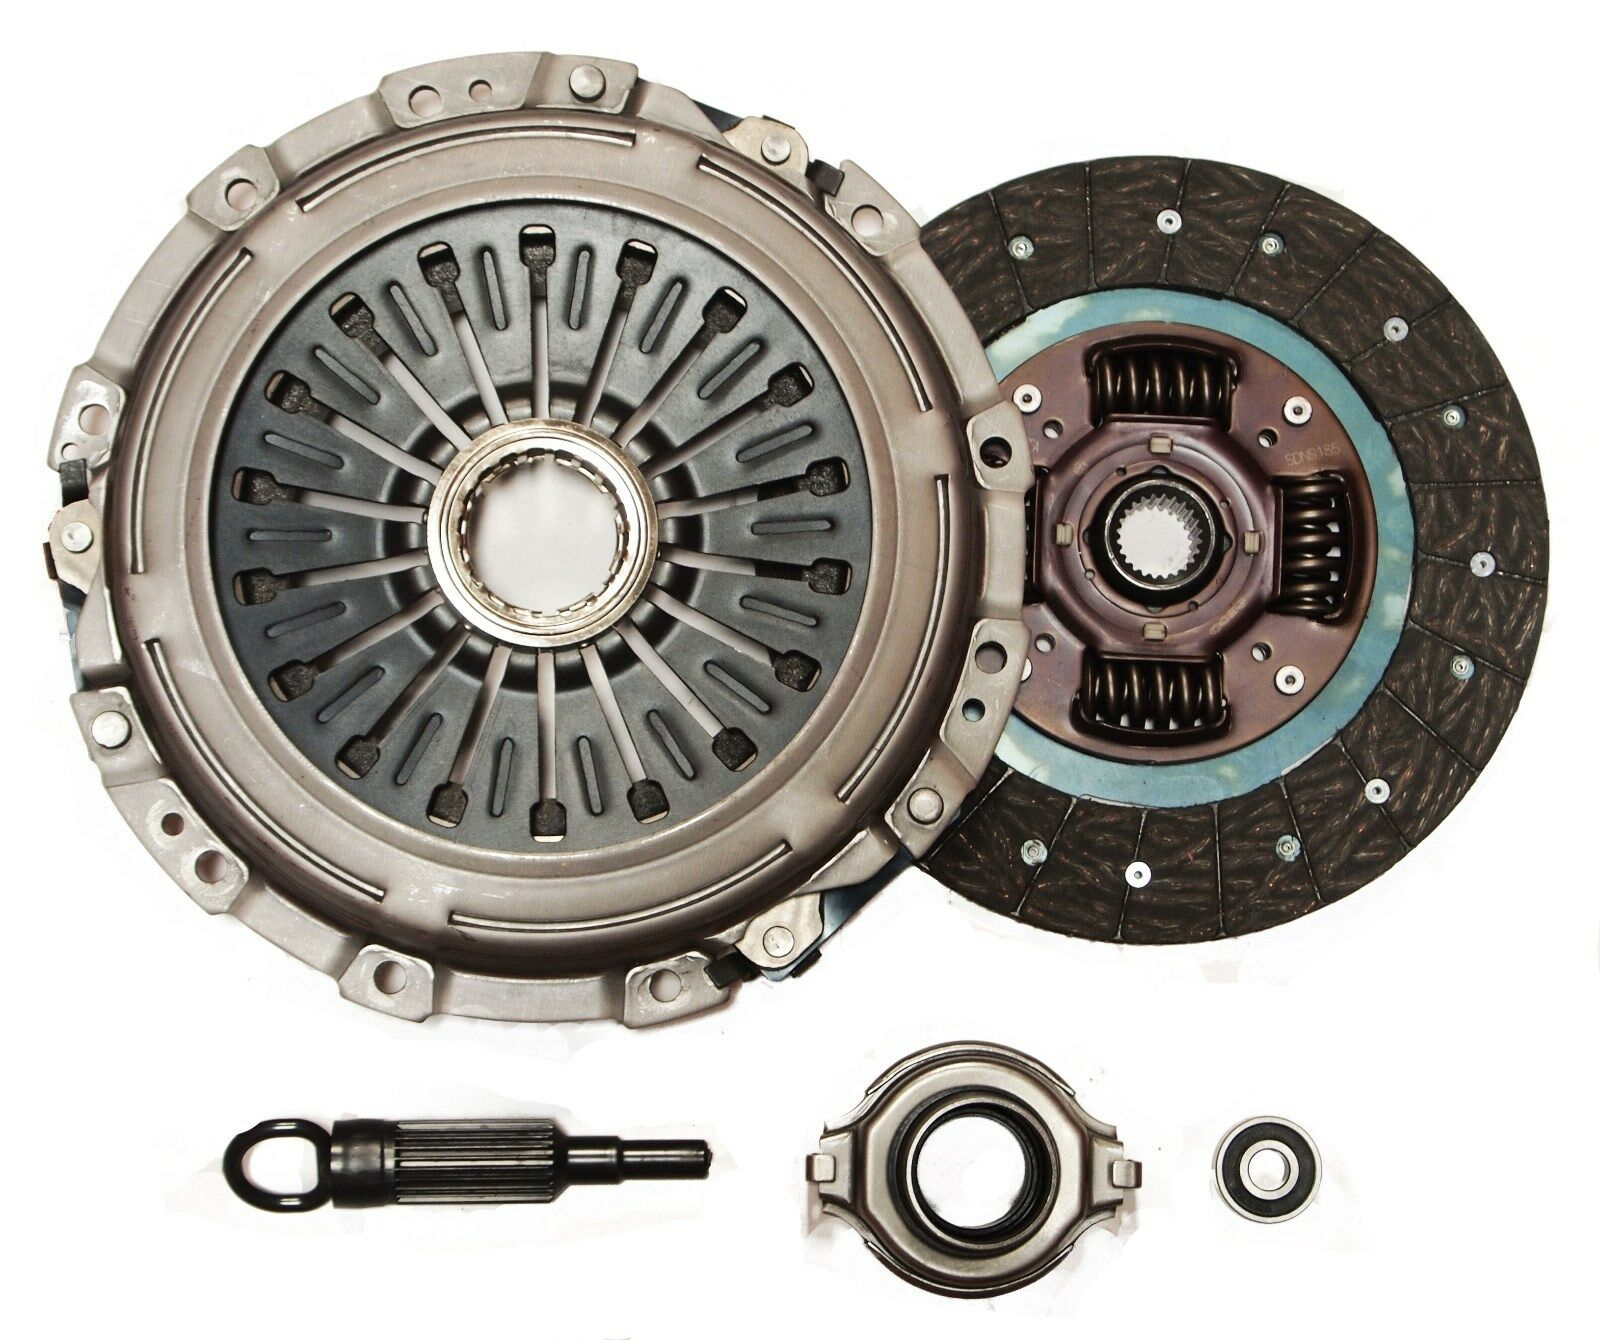 ACS Mega Stage 4 Clutch Kit for 04-14 Subaru Impreza WRX STi 2.5L TURBO EJ257